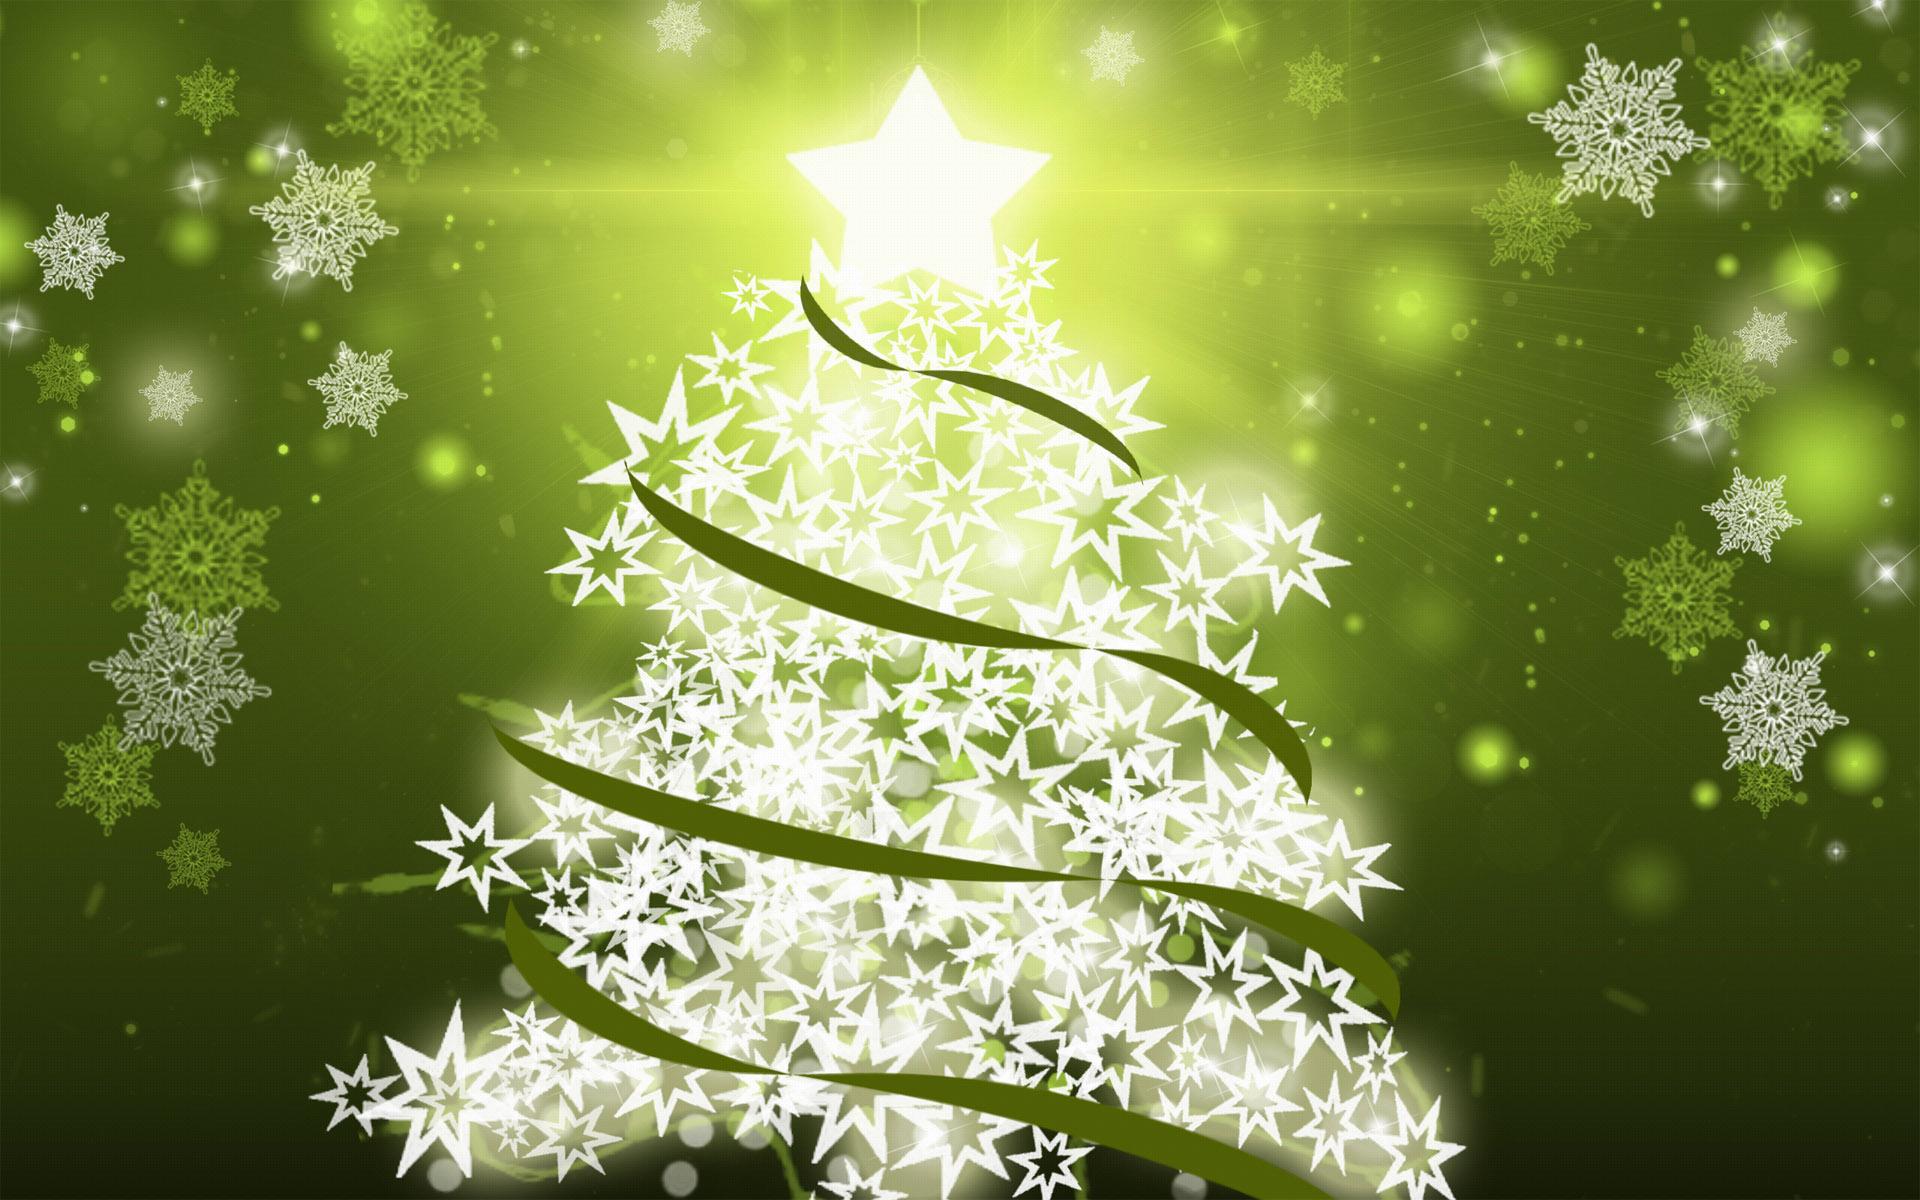 открытки со снежинками и елками арзни